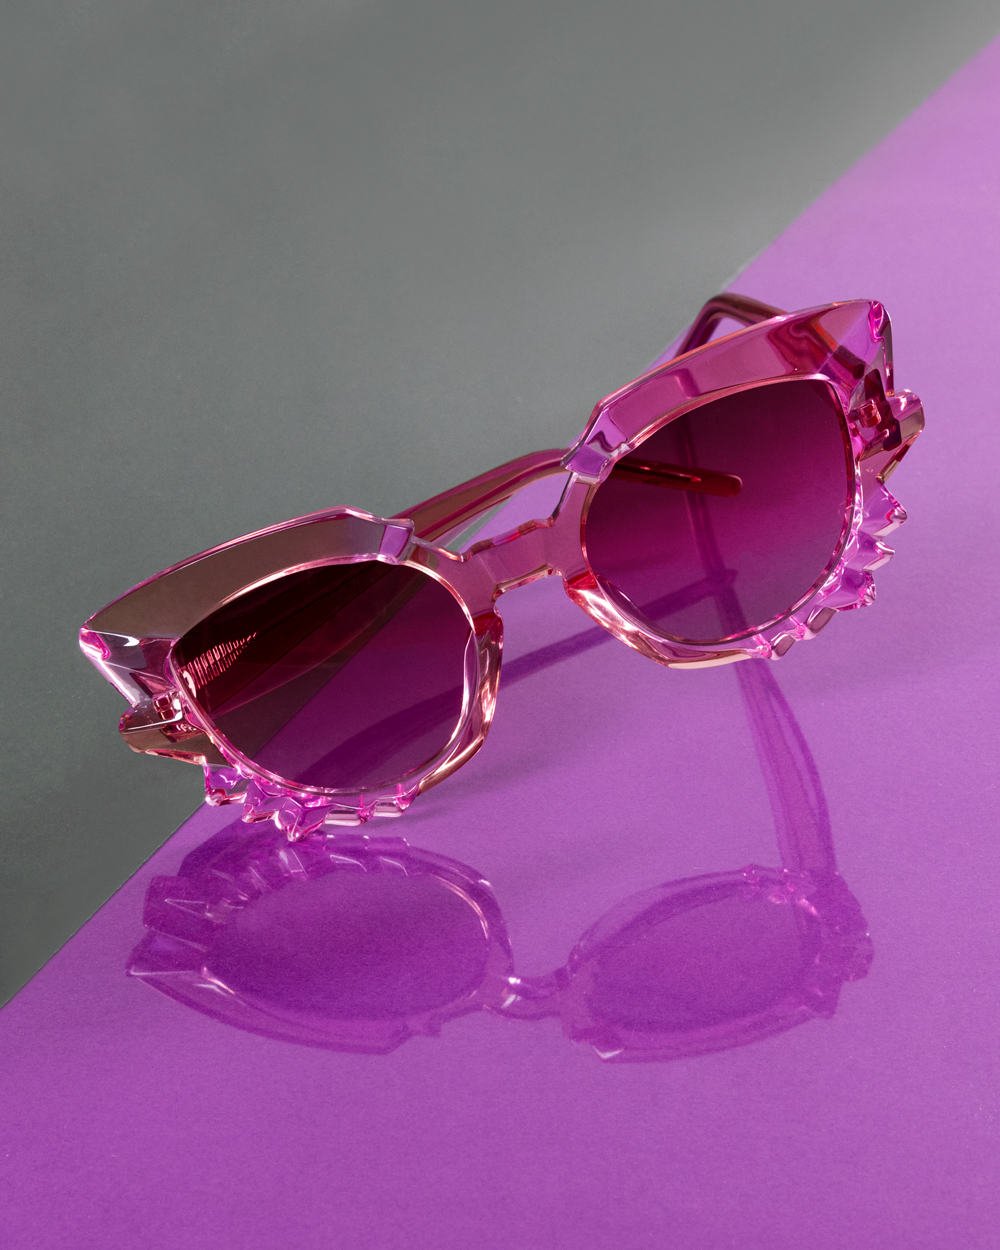 Oscar Mamooi sunglasses seen at Mido 2021.